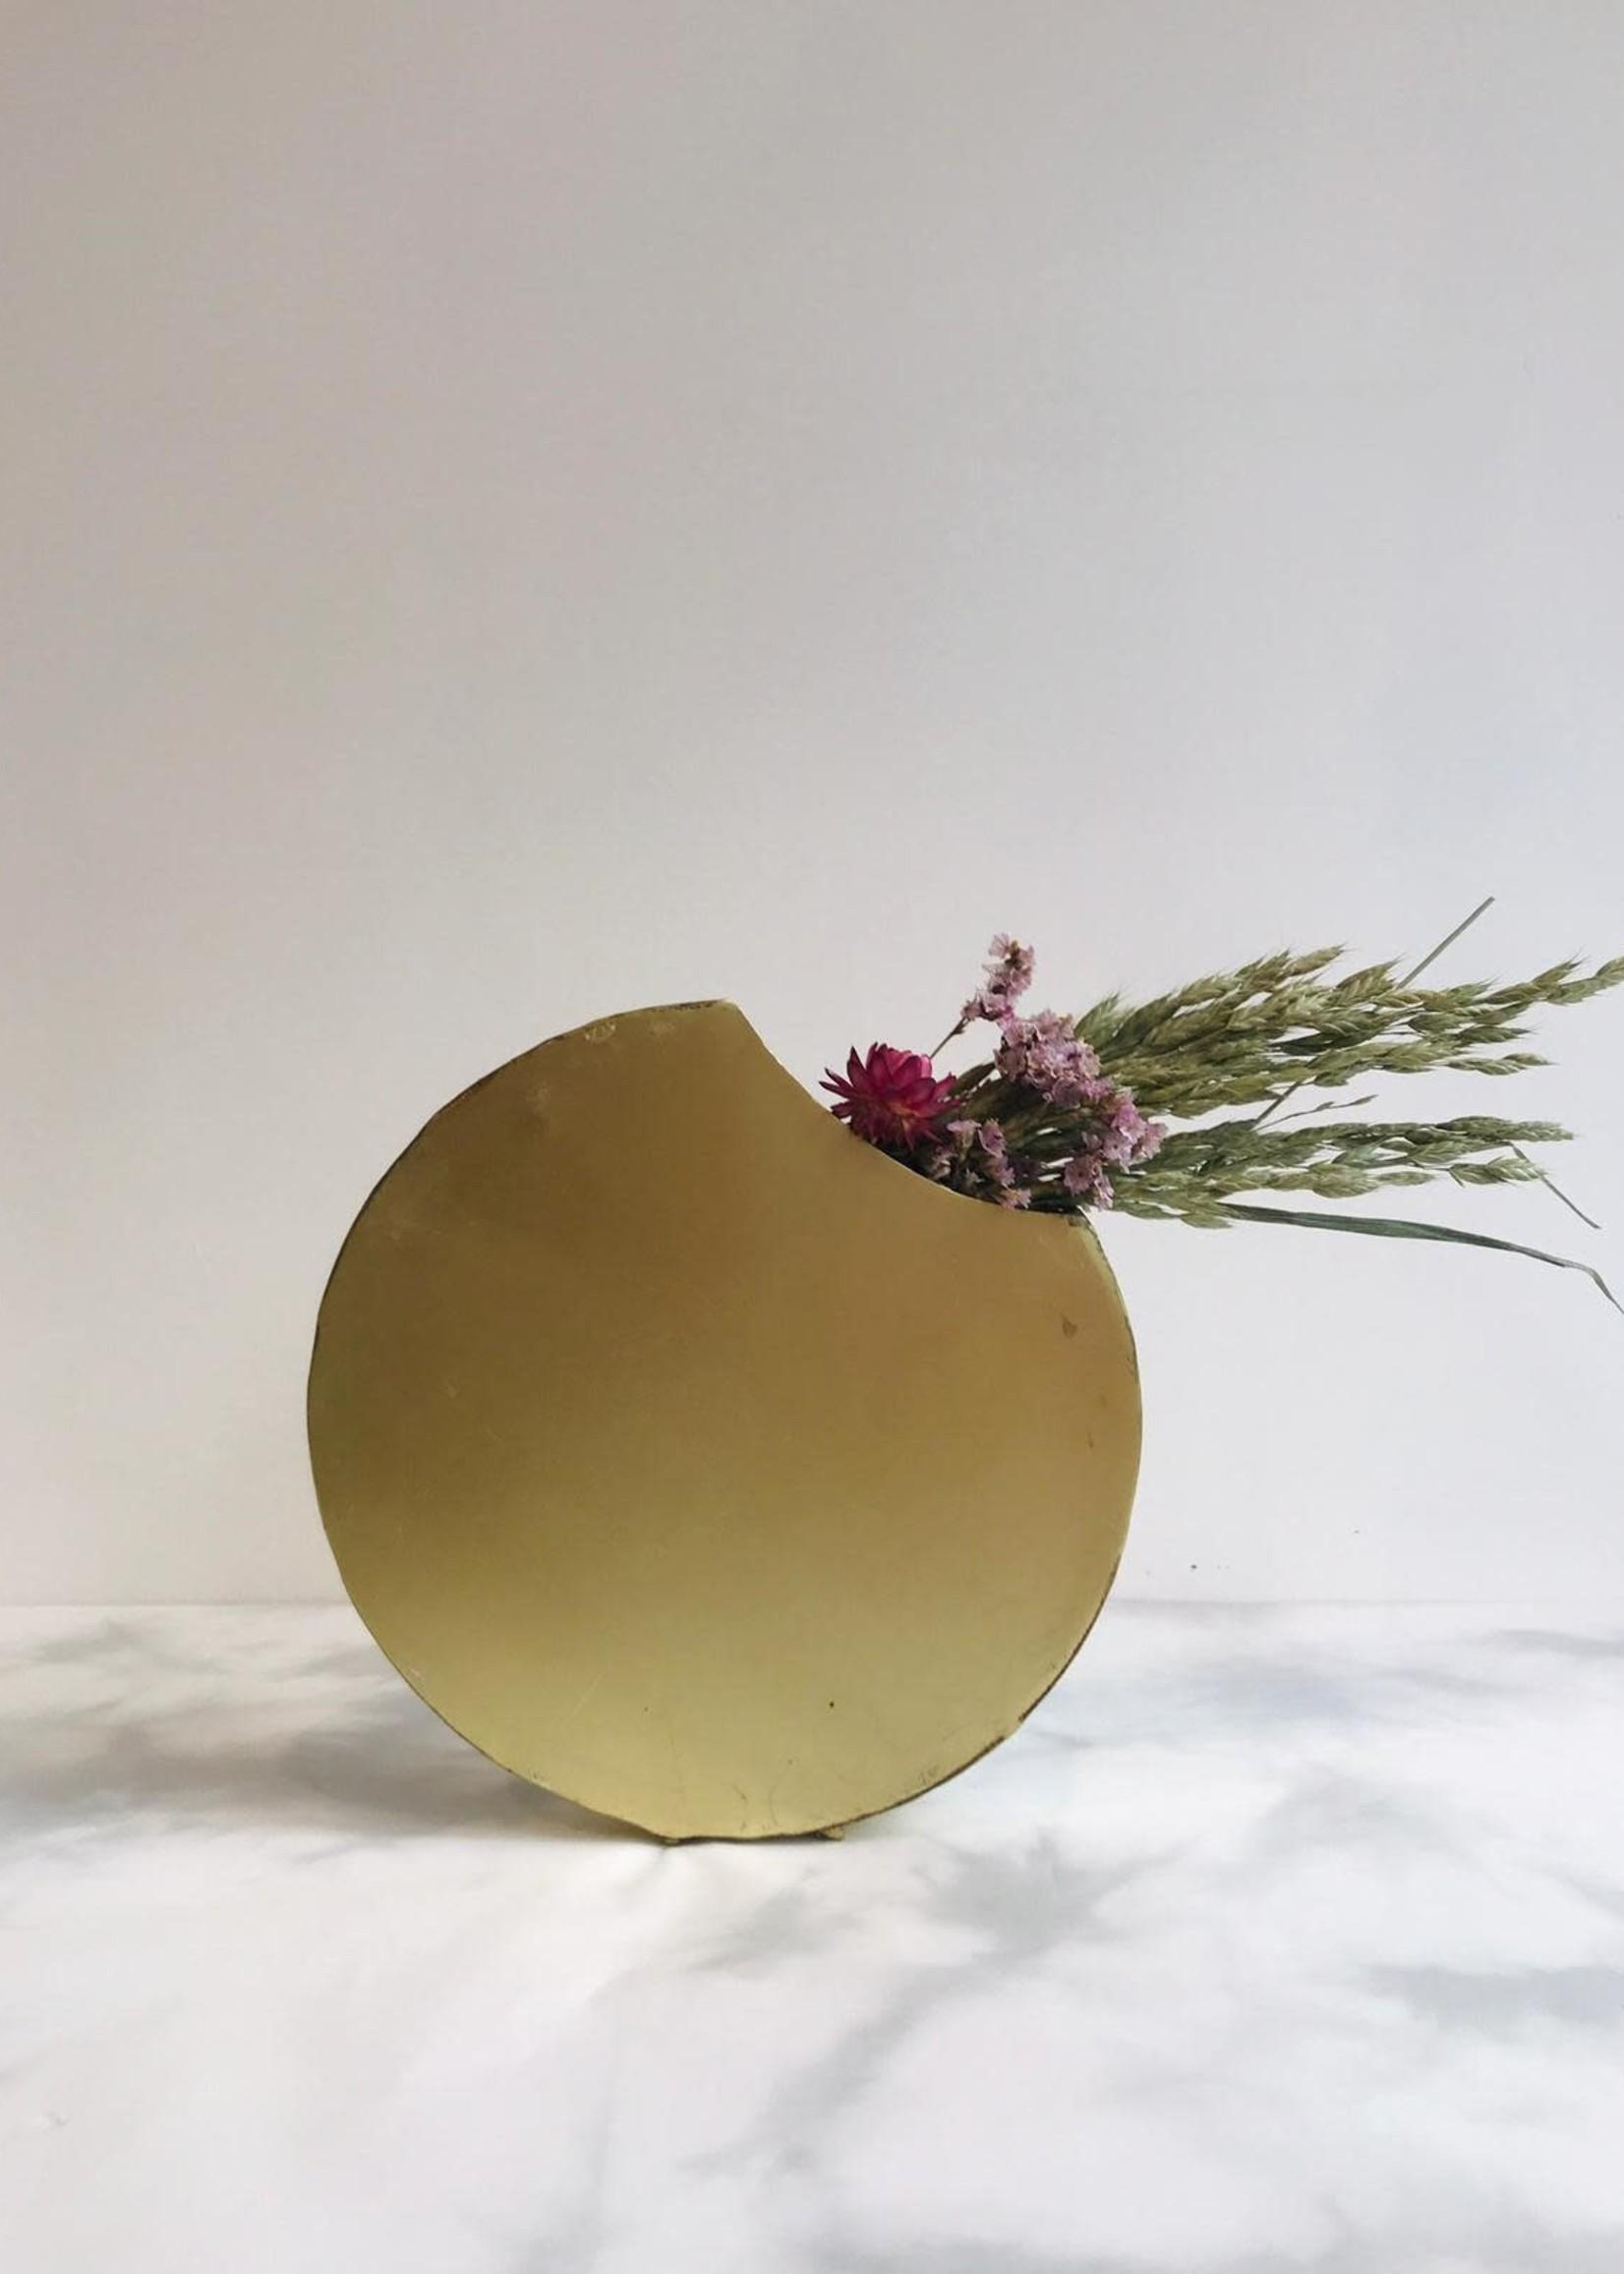 Naman Project Vaas MAAN ECLIPSE goud metaal 3 x 18 x 18 cm